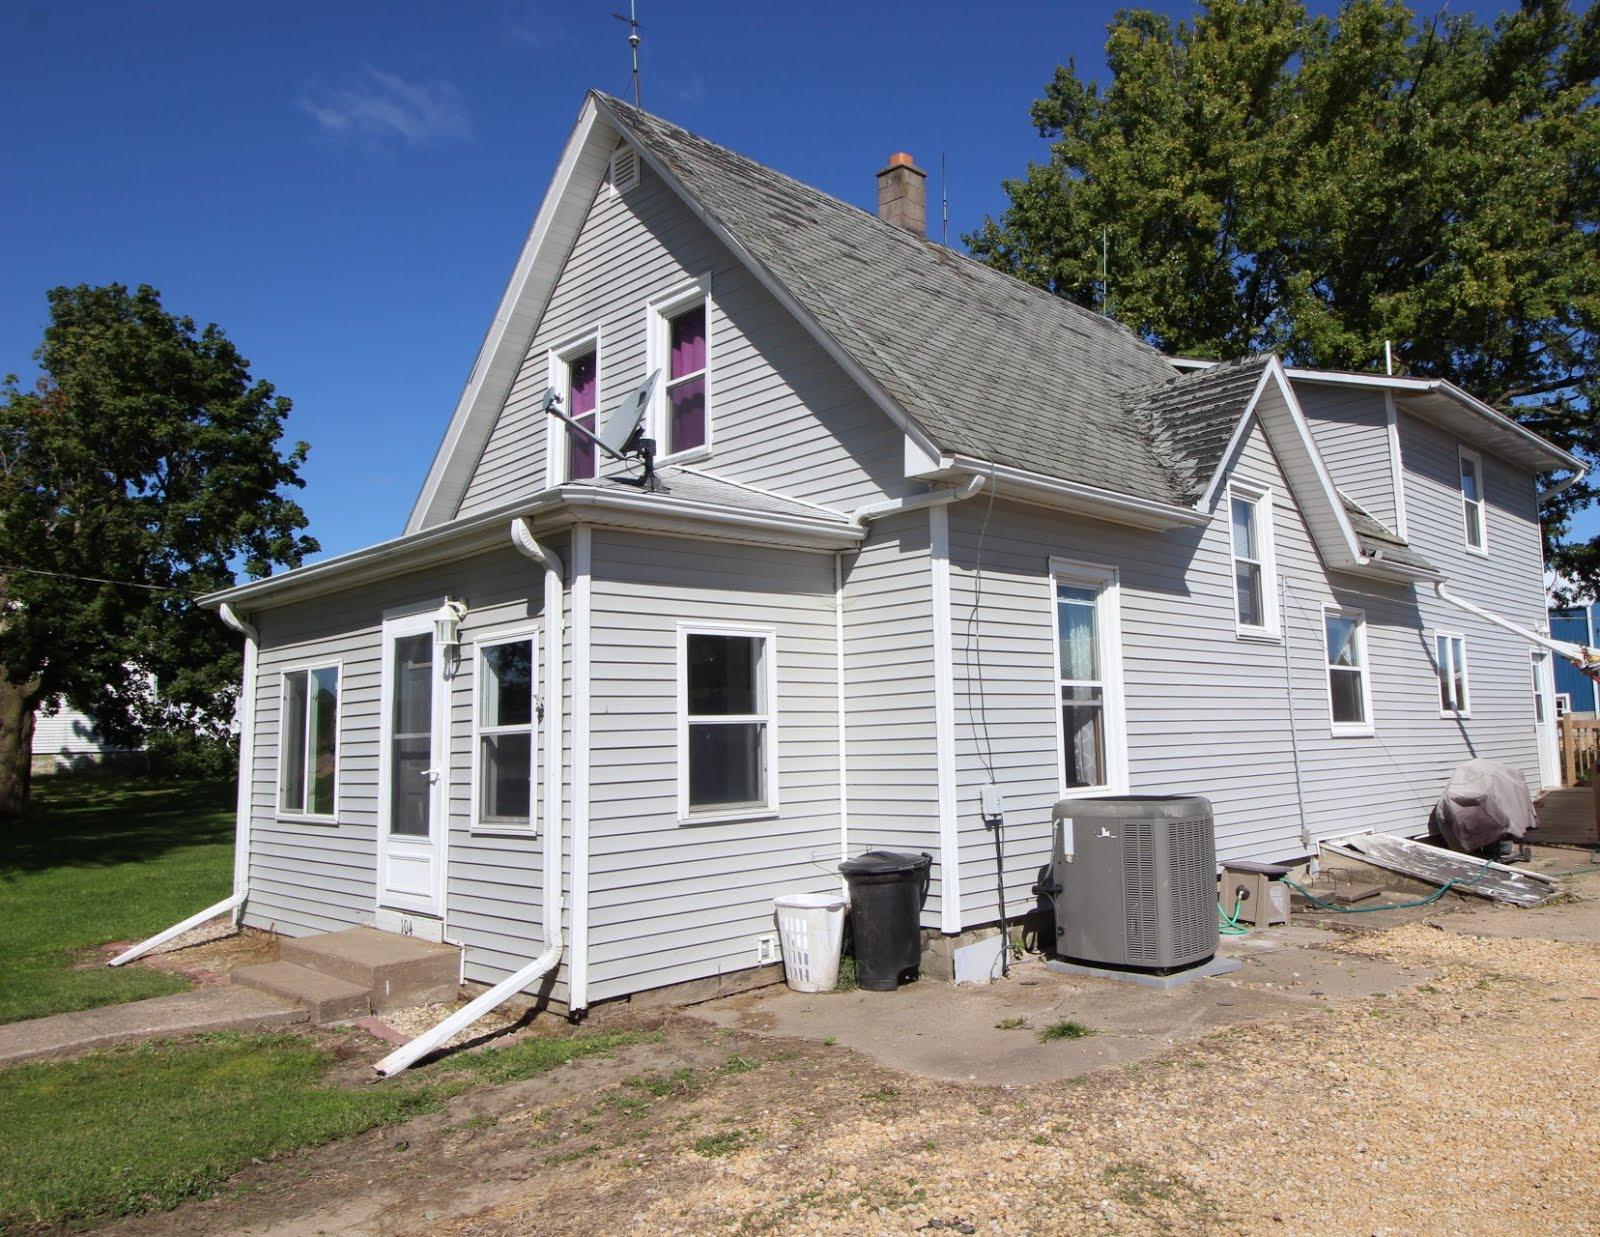 104 West Main St., Spragueville $65,000